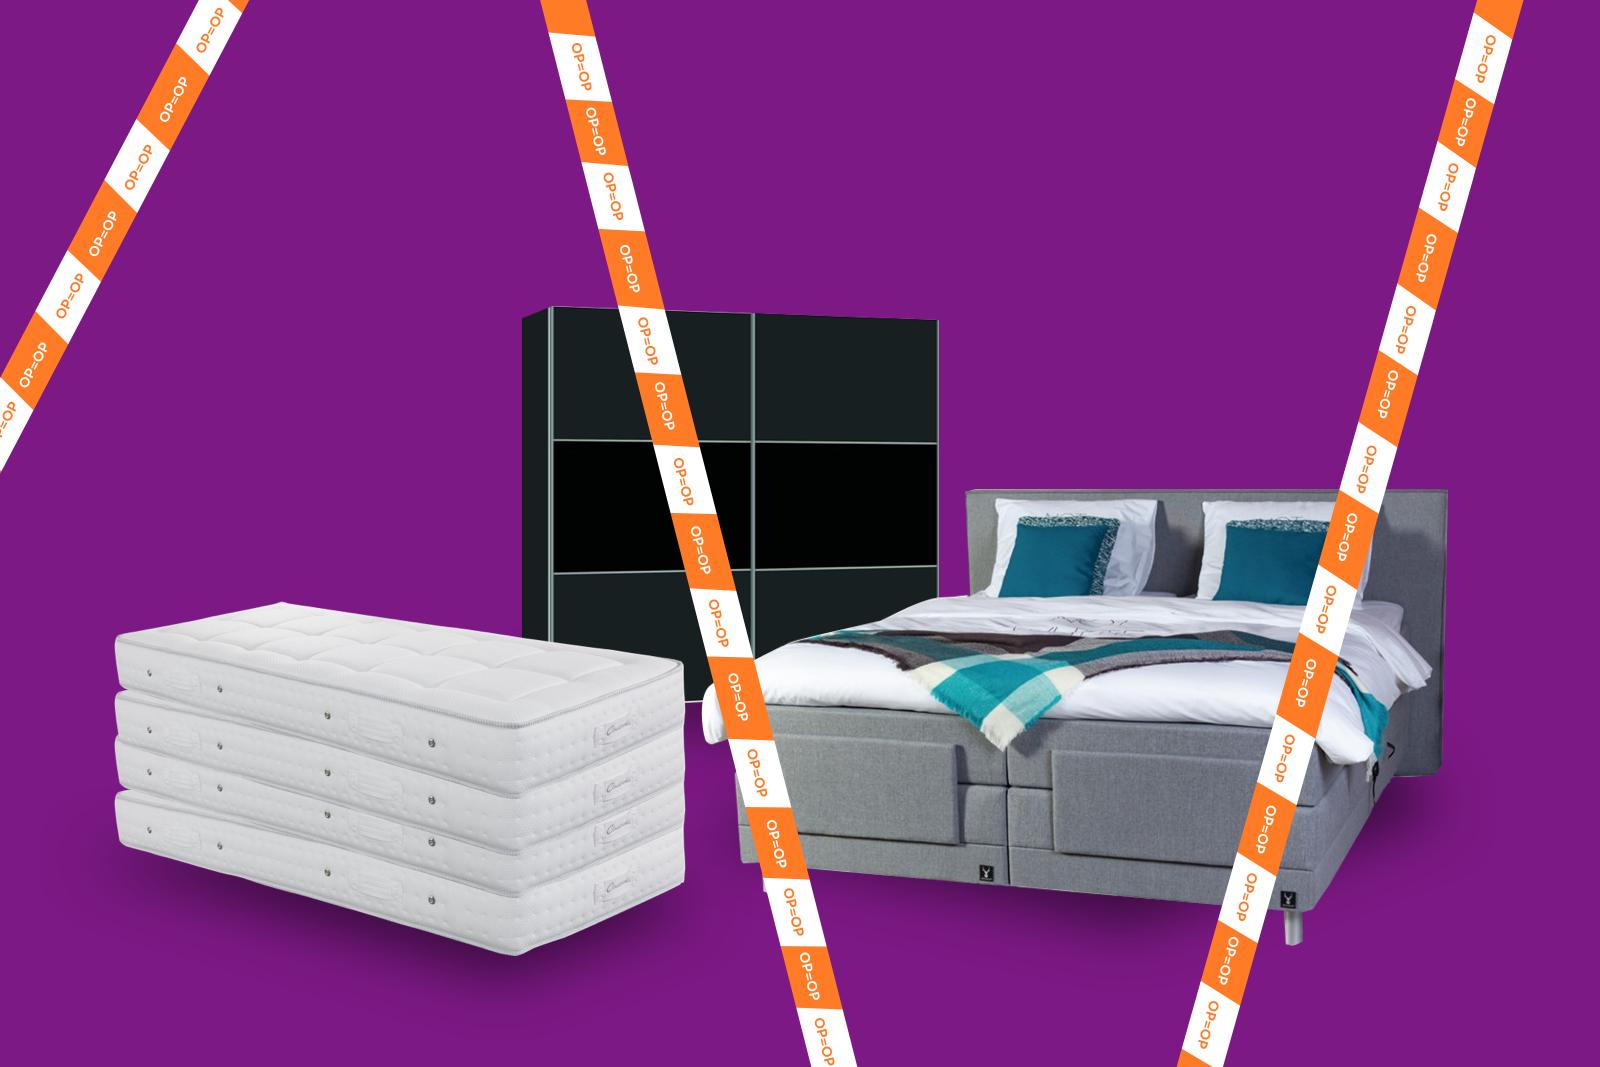 Bedbodem Outlet in Den Bosch